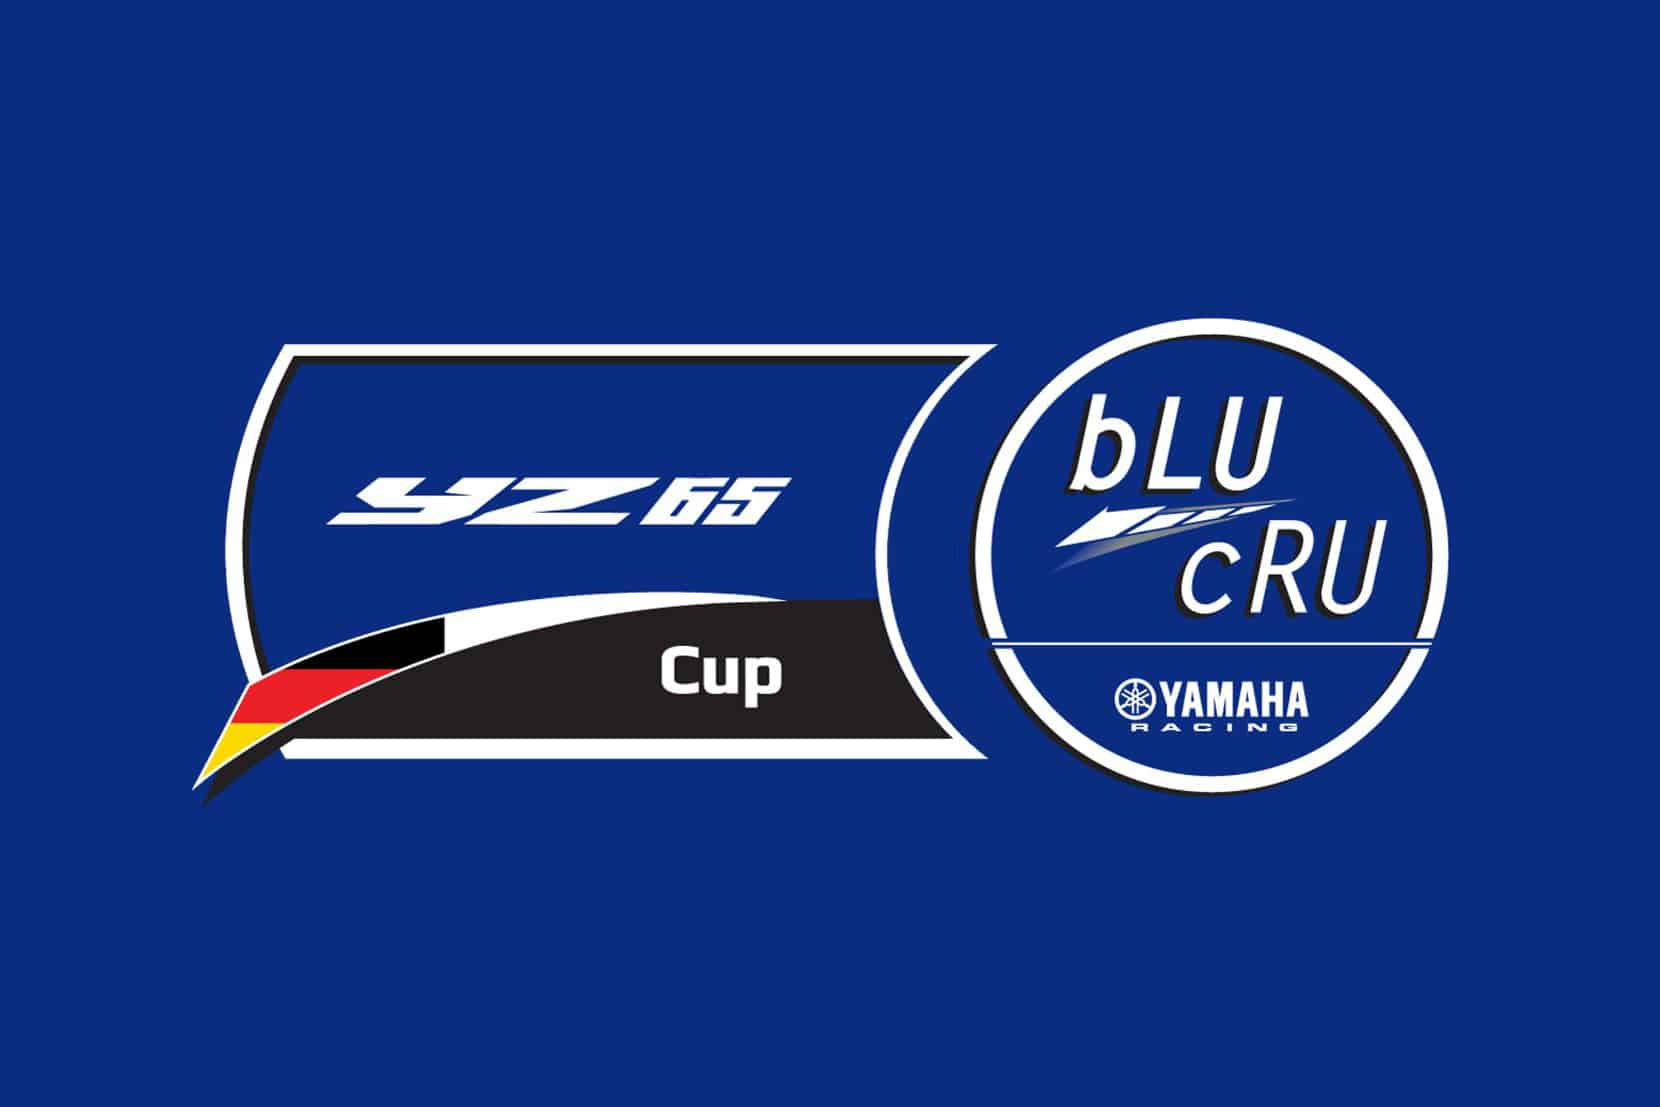 YZ bLU cRU FIM Europe Cup – Ergebnisse Klasse 65ccm Wertungslauf